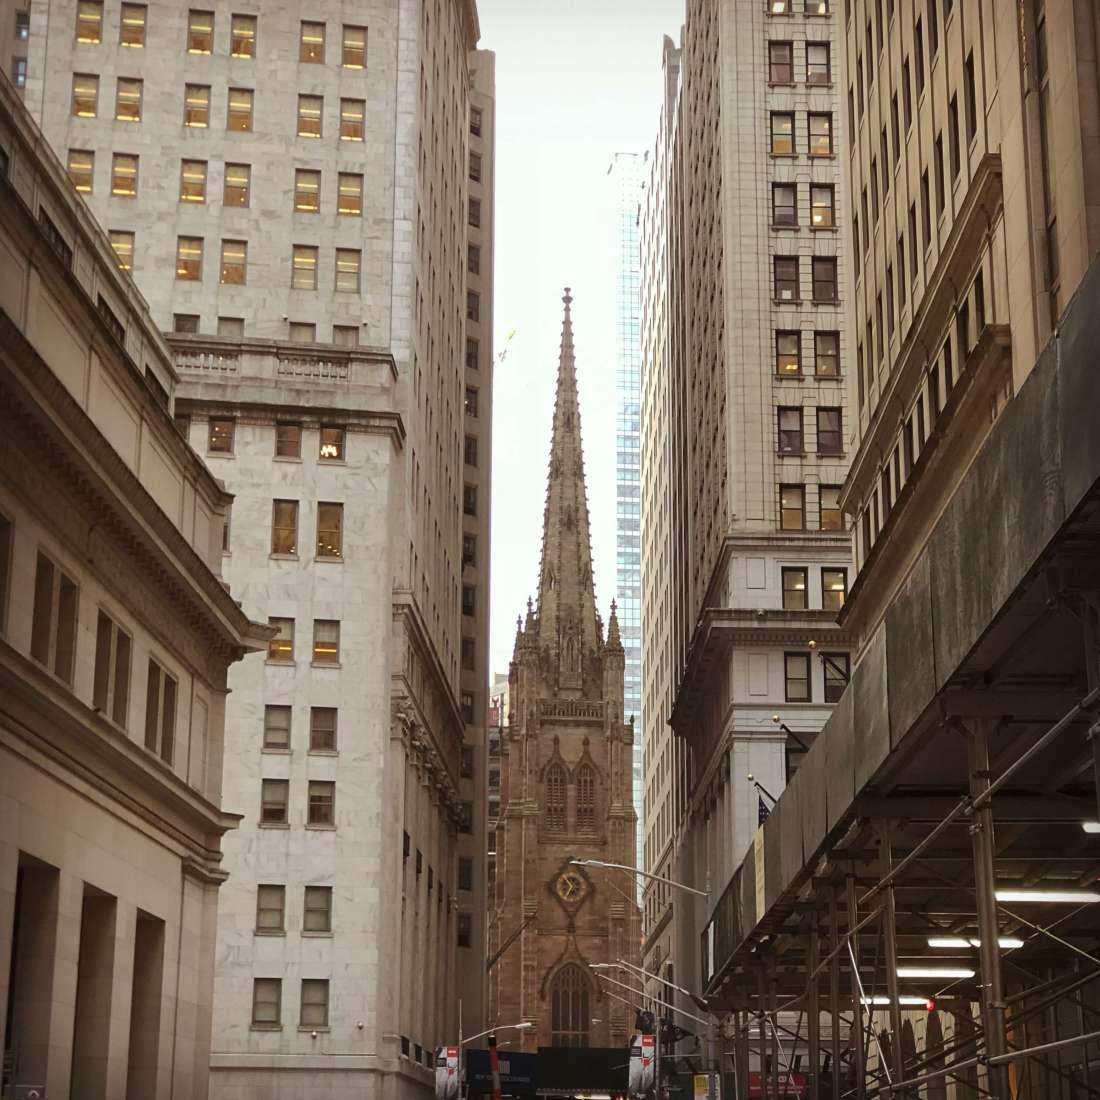 Trinity Church as seen from near the Stock Exchange in Wall StreetTrinity Church as seen from near the Stock Exchange in Wall Street